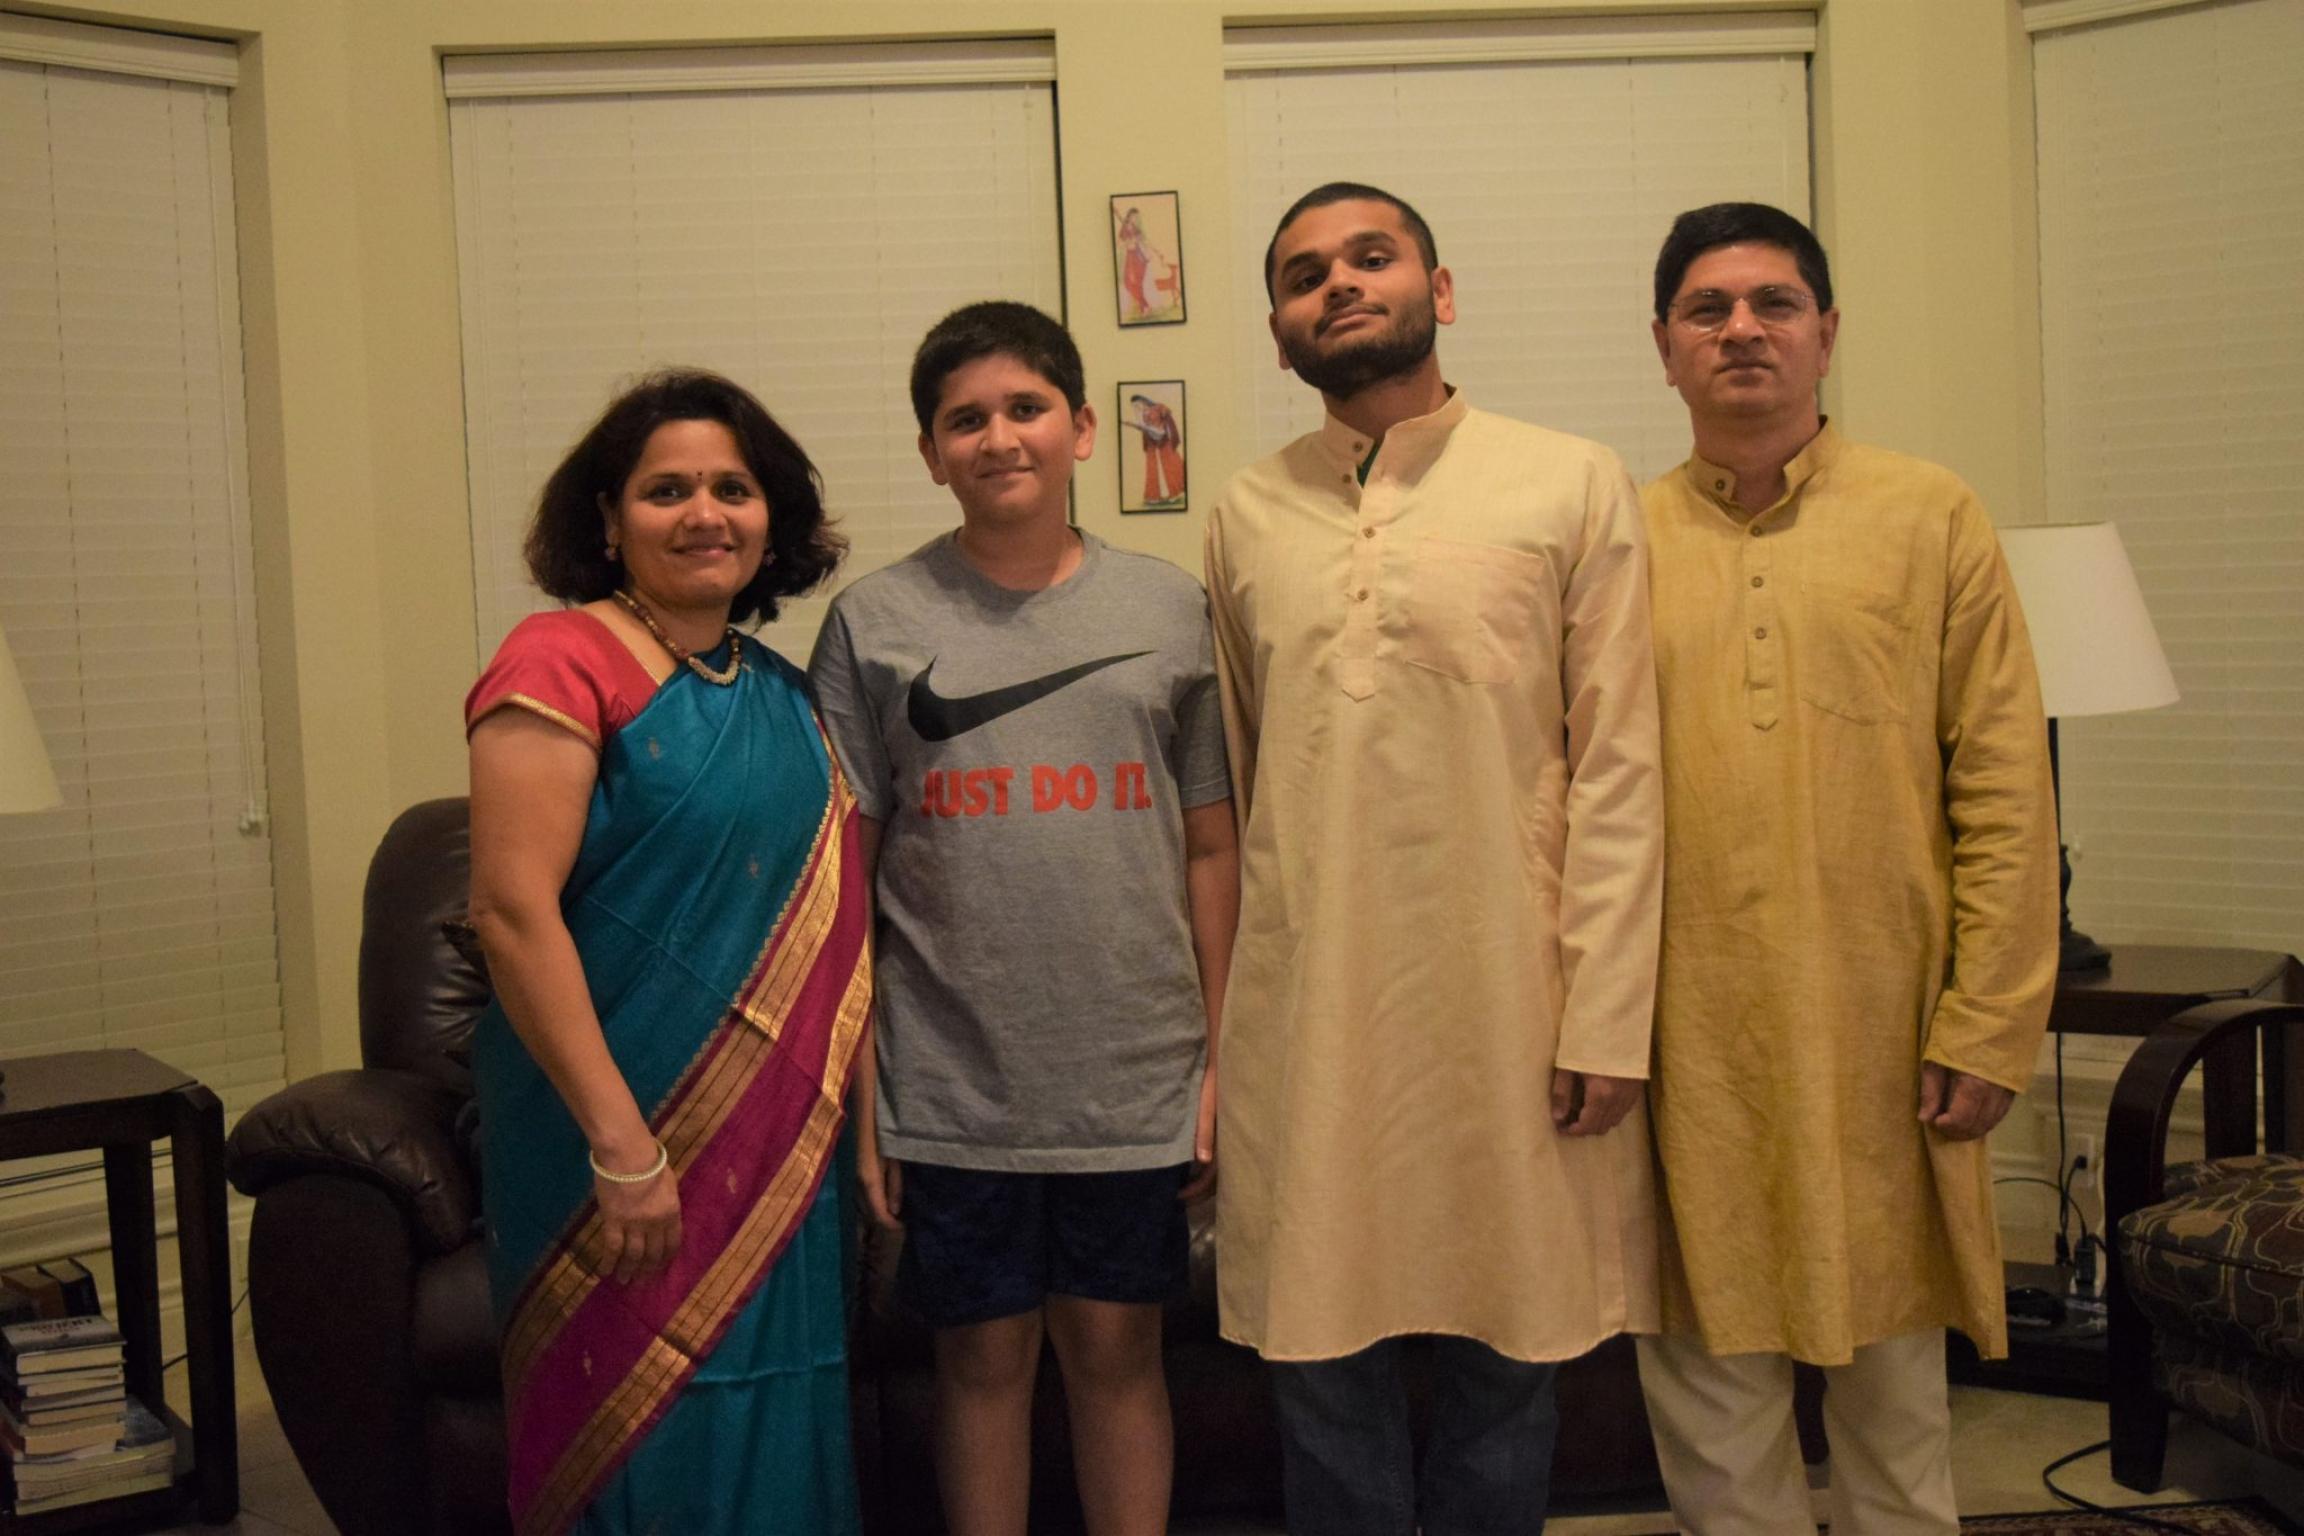 Animesh Namjoshi, center right, celebrates Diwali with his father, Jayant, mother, Sarita, and brother Aditya.